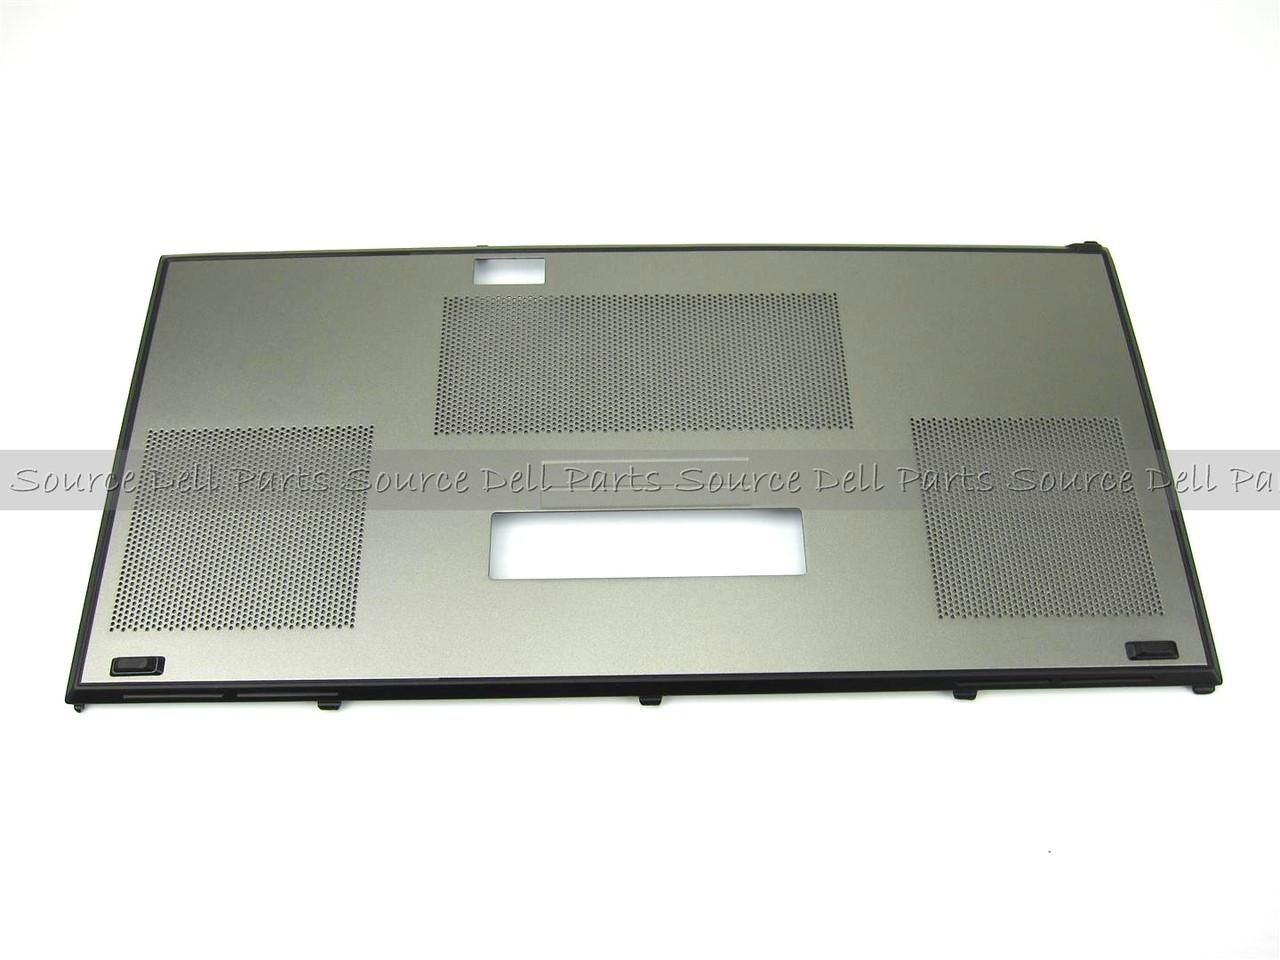 Dell Precision M6500 Bottom Base Access Panel Door  - 3JW5K